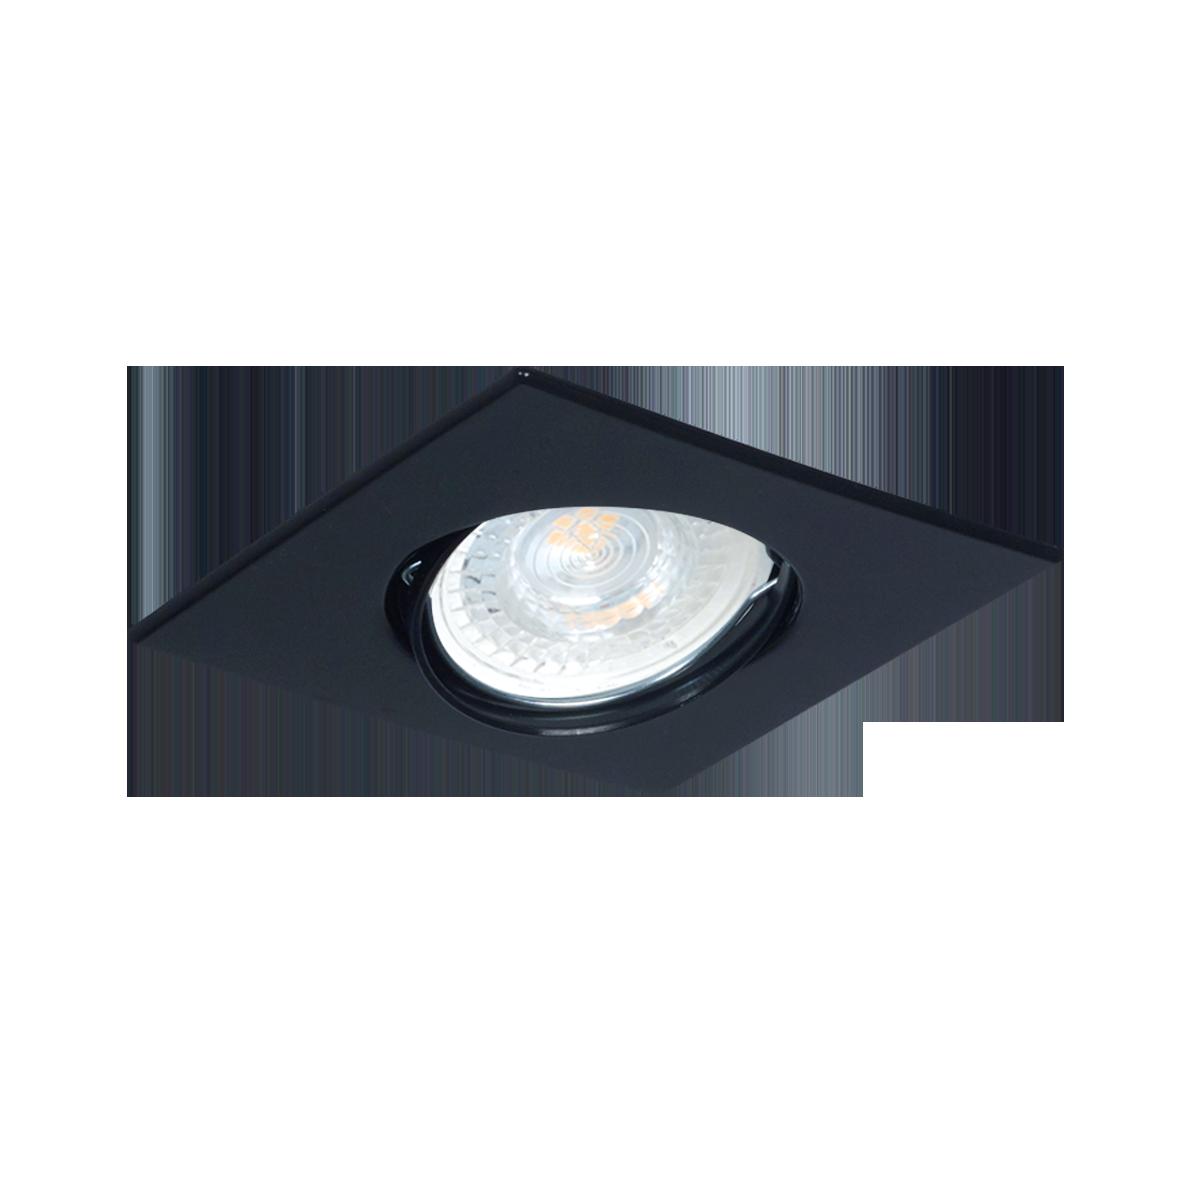 Iluminacion Led, Spot de Embutir Cuadrado de policarbonato inyectado